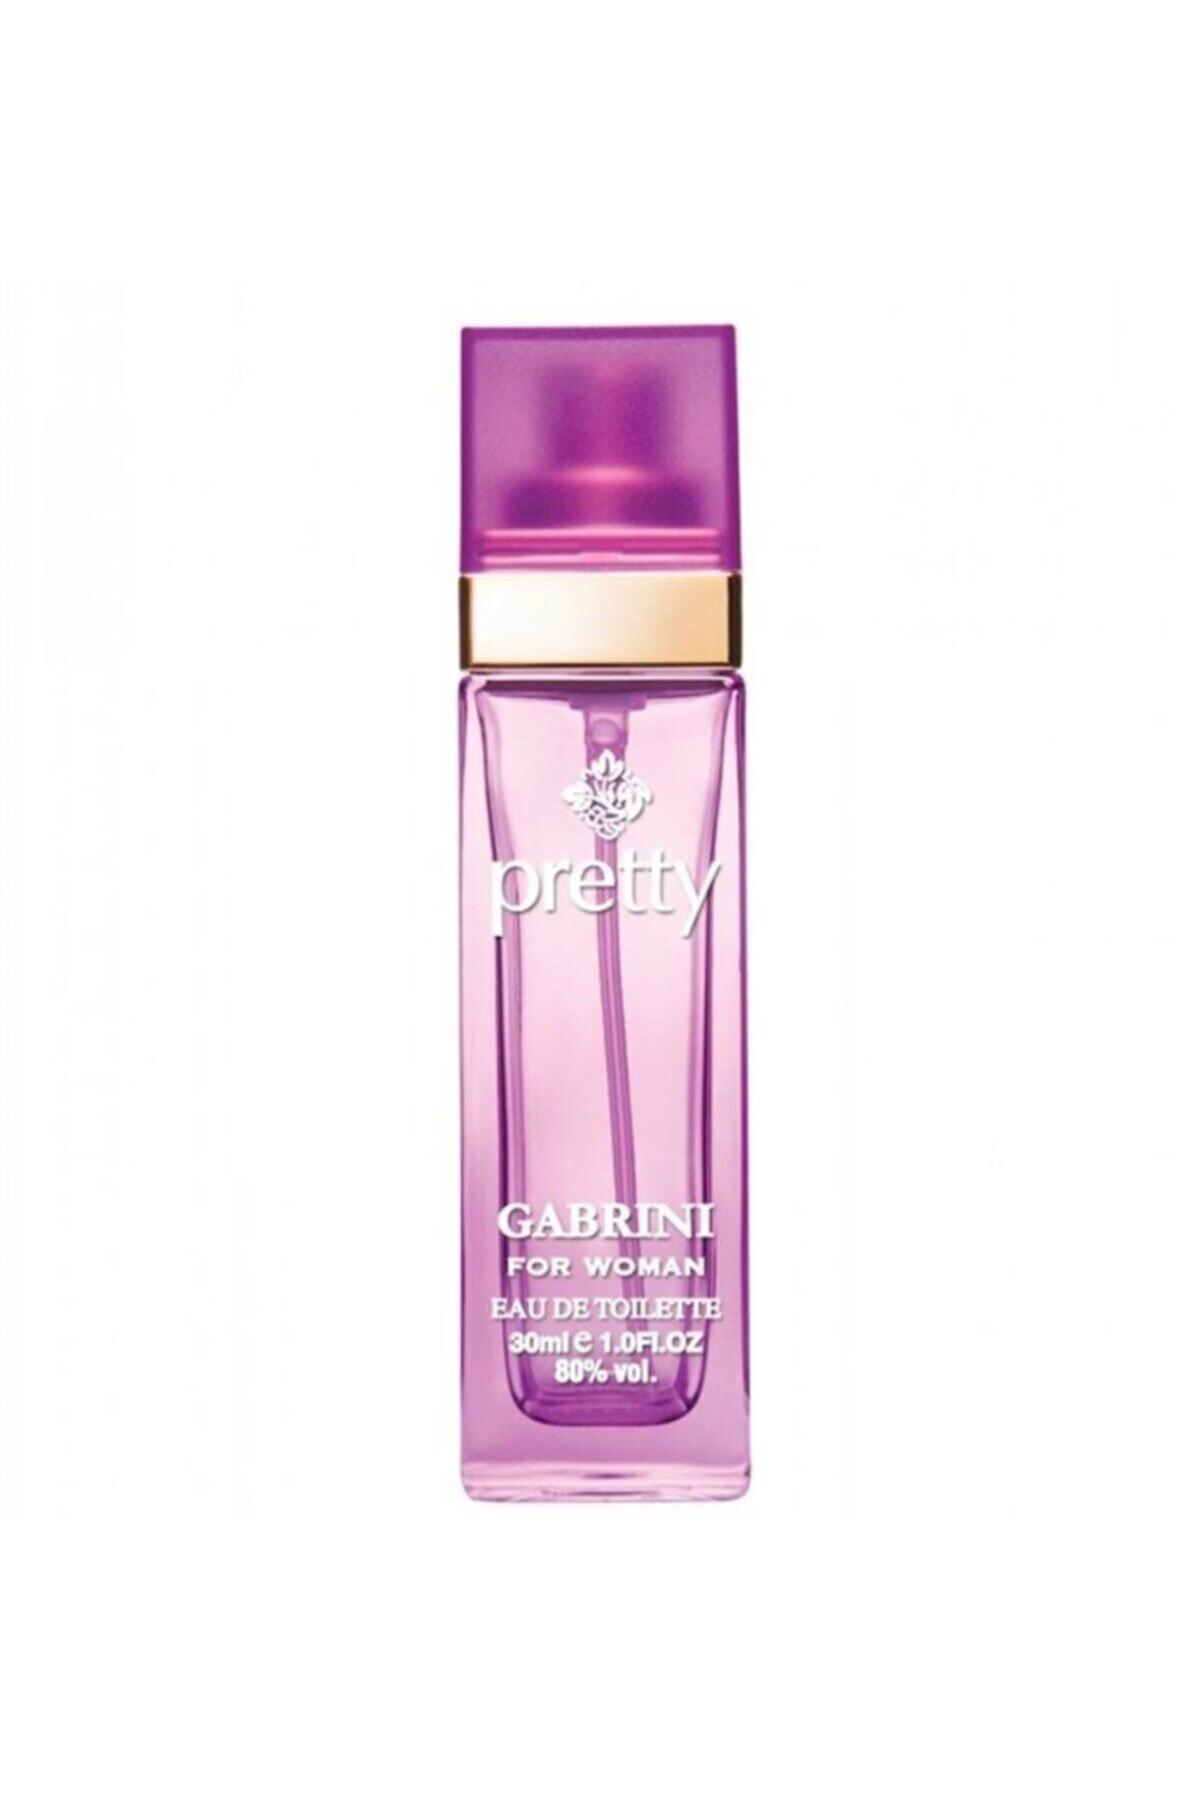 Gabrini Pretty Kadın Parfümü Edt 30 ml No:3 8696814064530 1